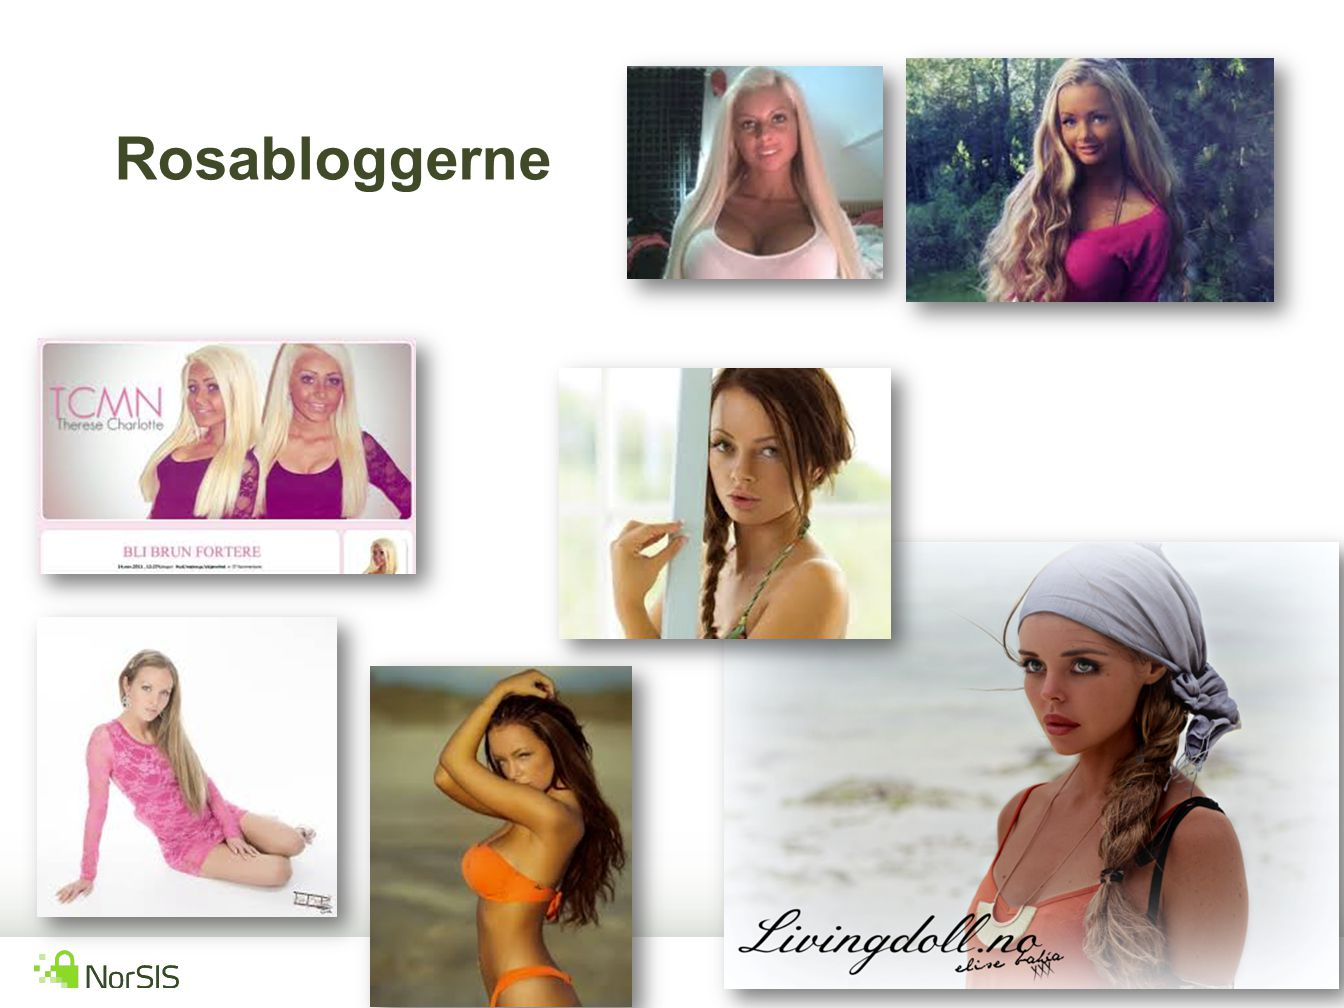 Rosabloggerne